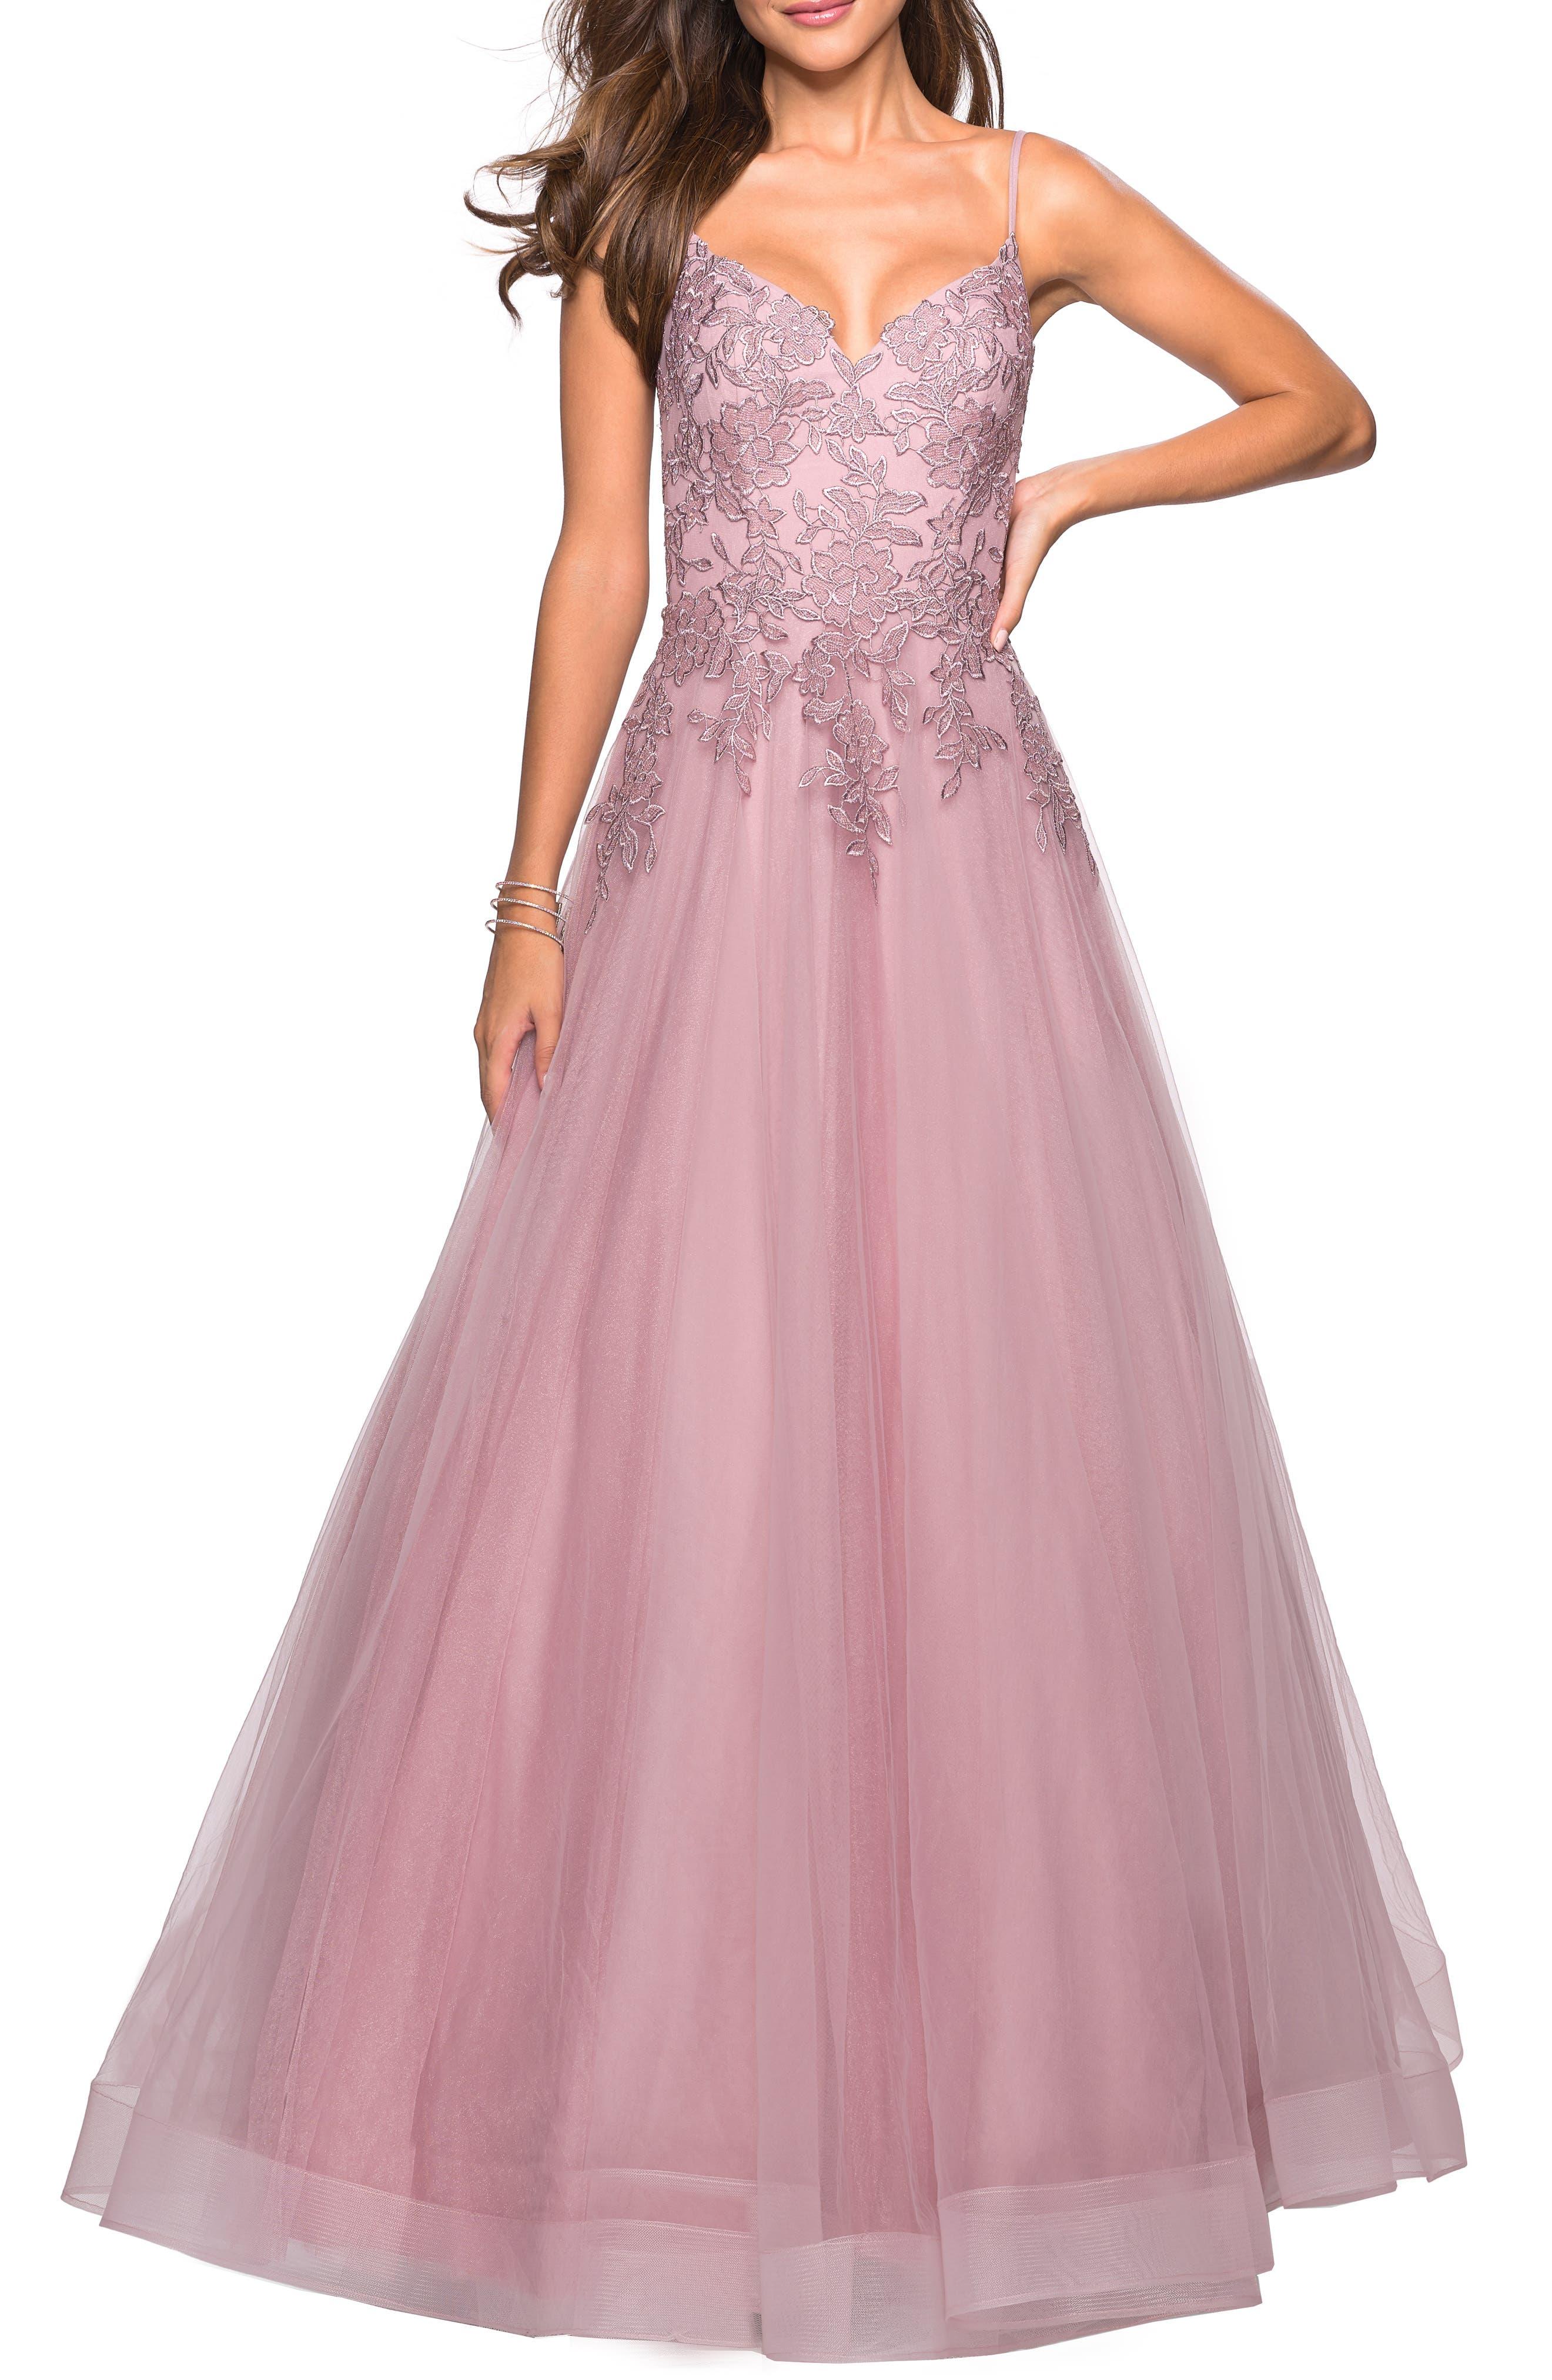 LA FEMME Lace & Tulle Flared Skirt Evening Dress, Main, color, MAUVE